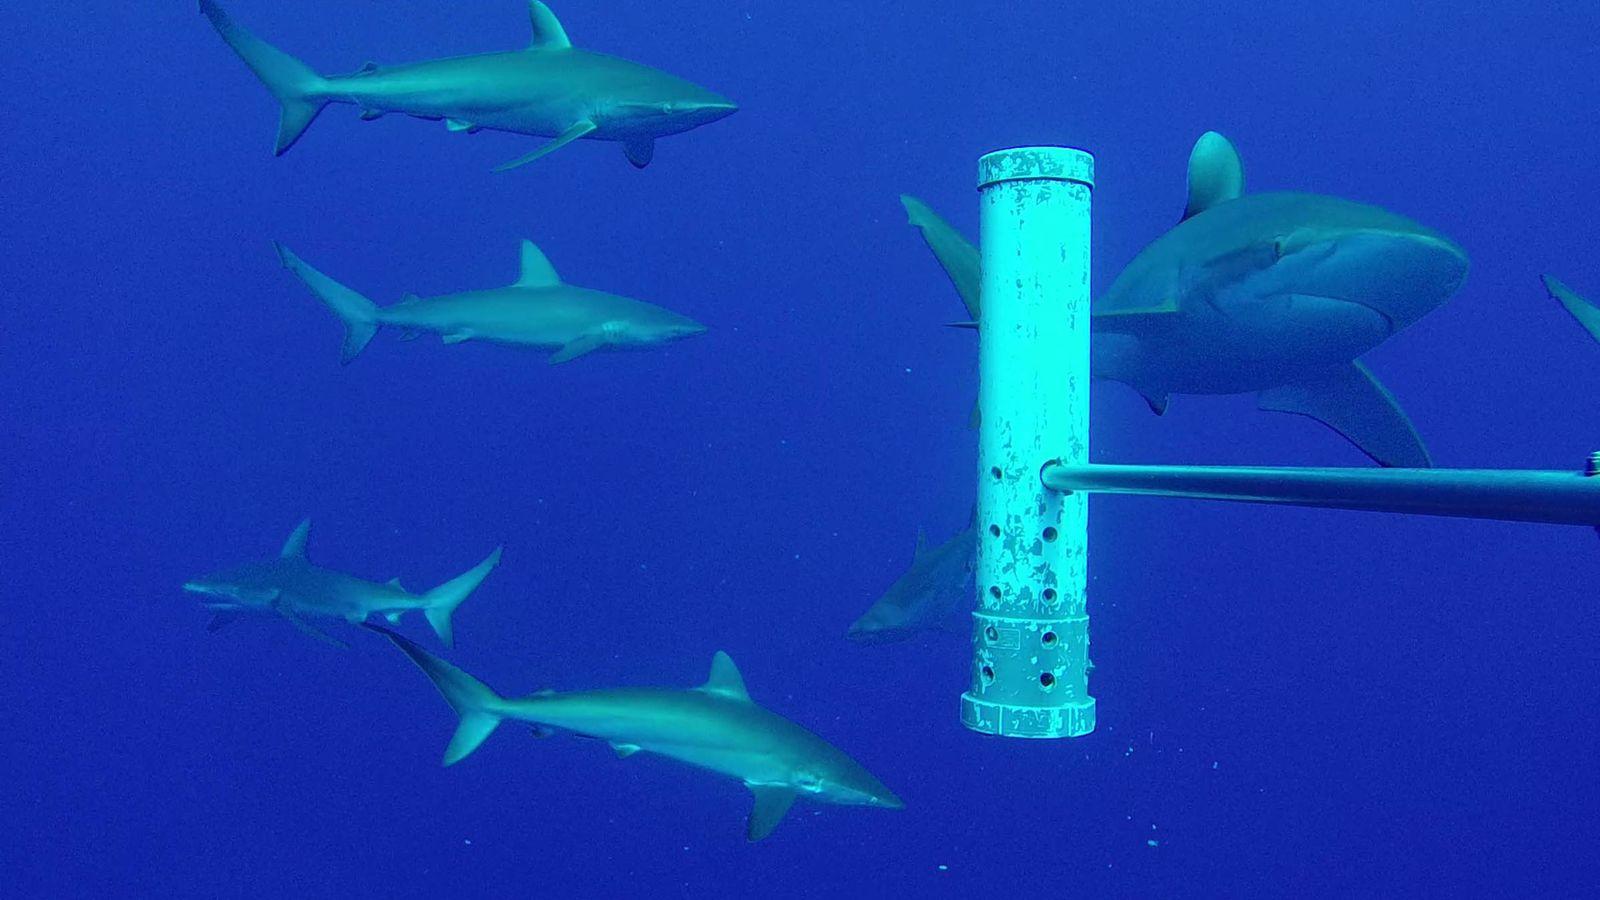 Network of underwater cameras to protect wildlife in UK Overseas Territories